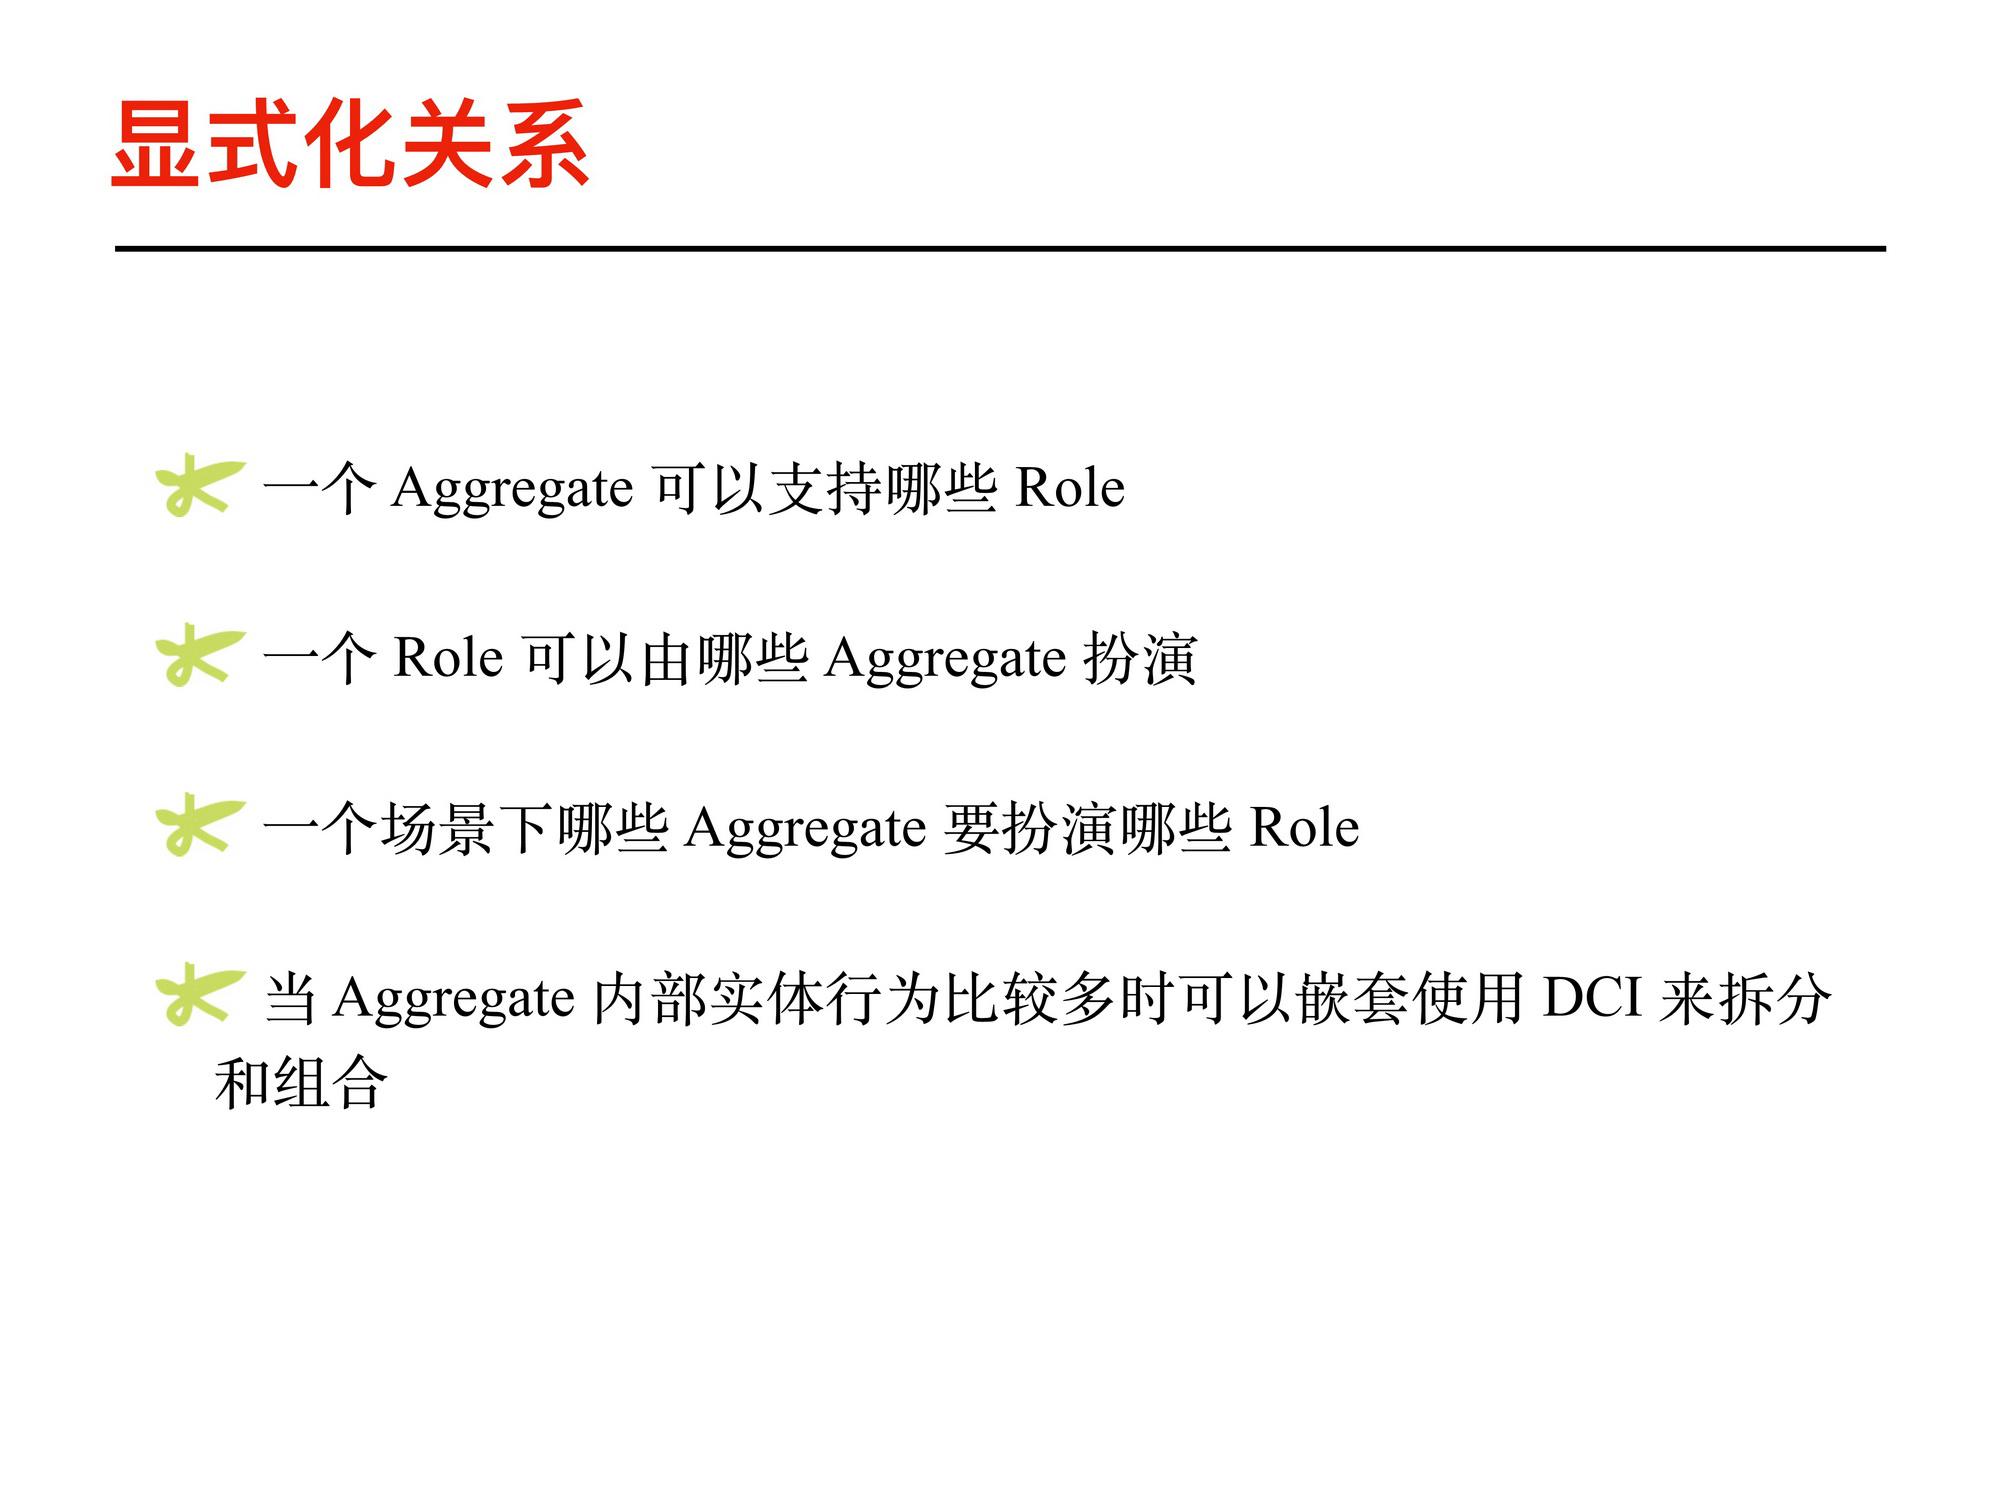 当 DDD 遇上 DCI(Data, Context, Interactive)架构模式